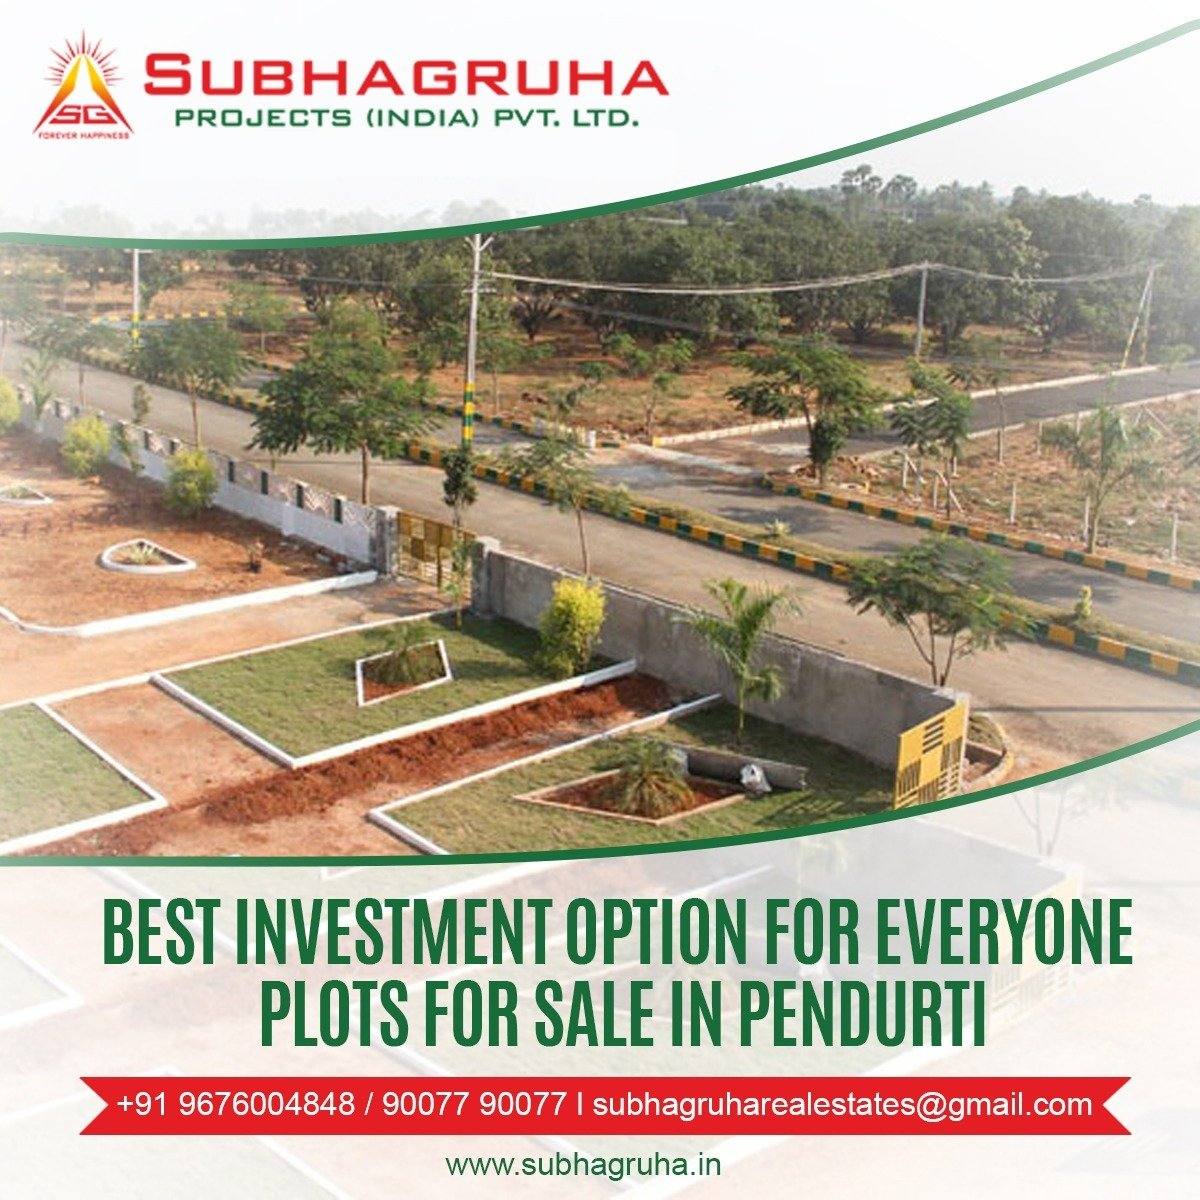 vuda approved plots in vizag  Subhagruha